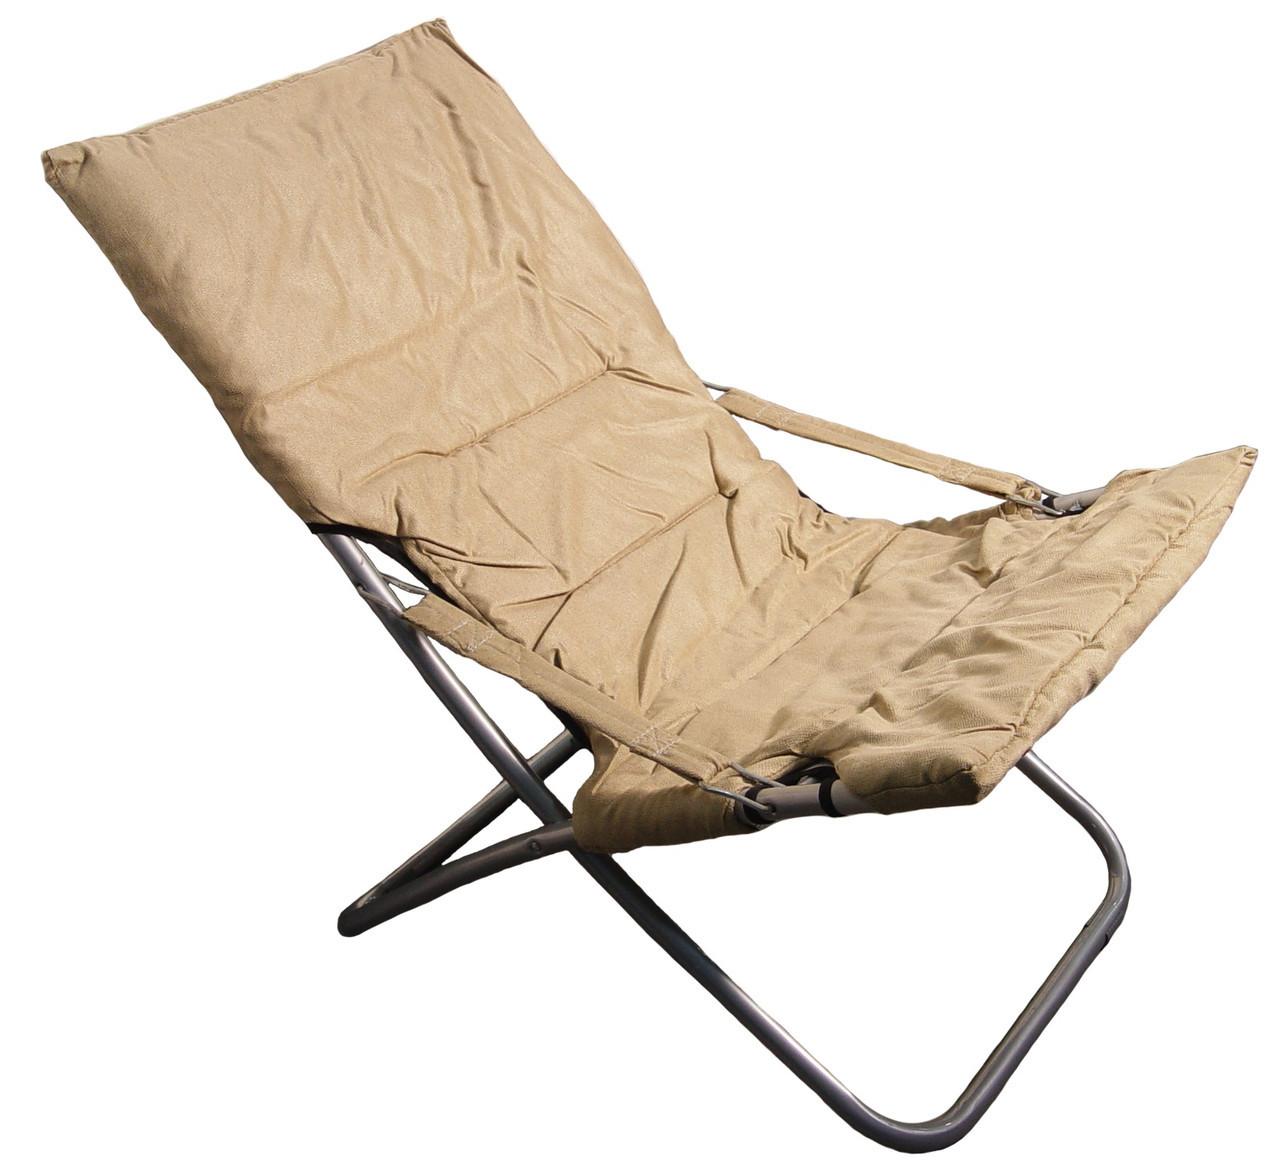 Кресло-шезлонг R28812 100х61х95 см, бежевое